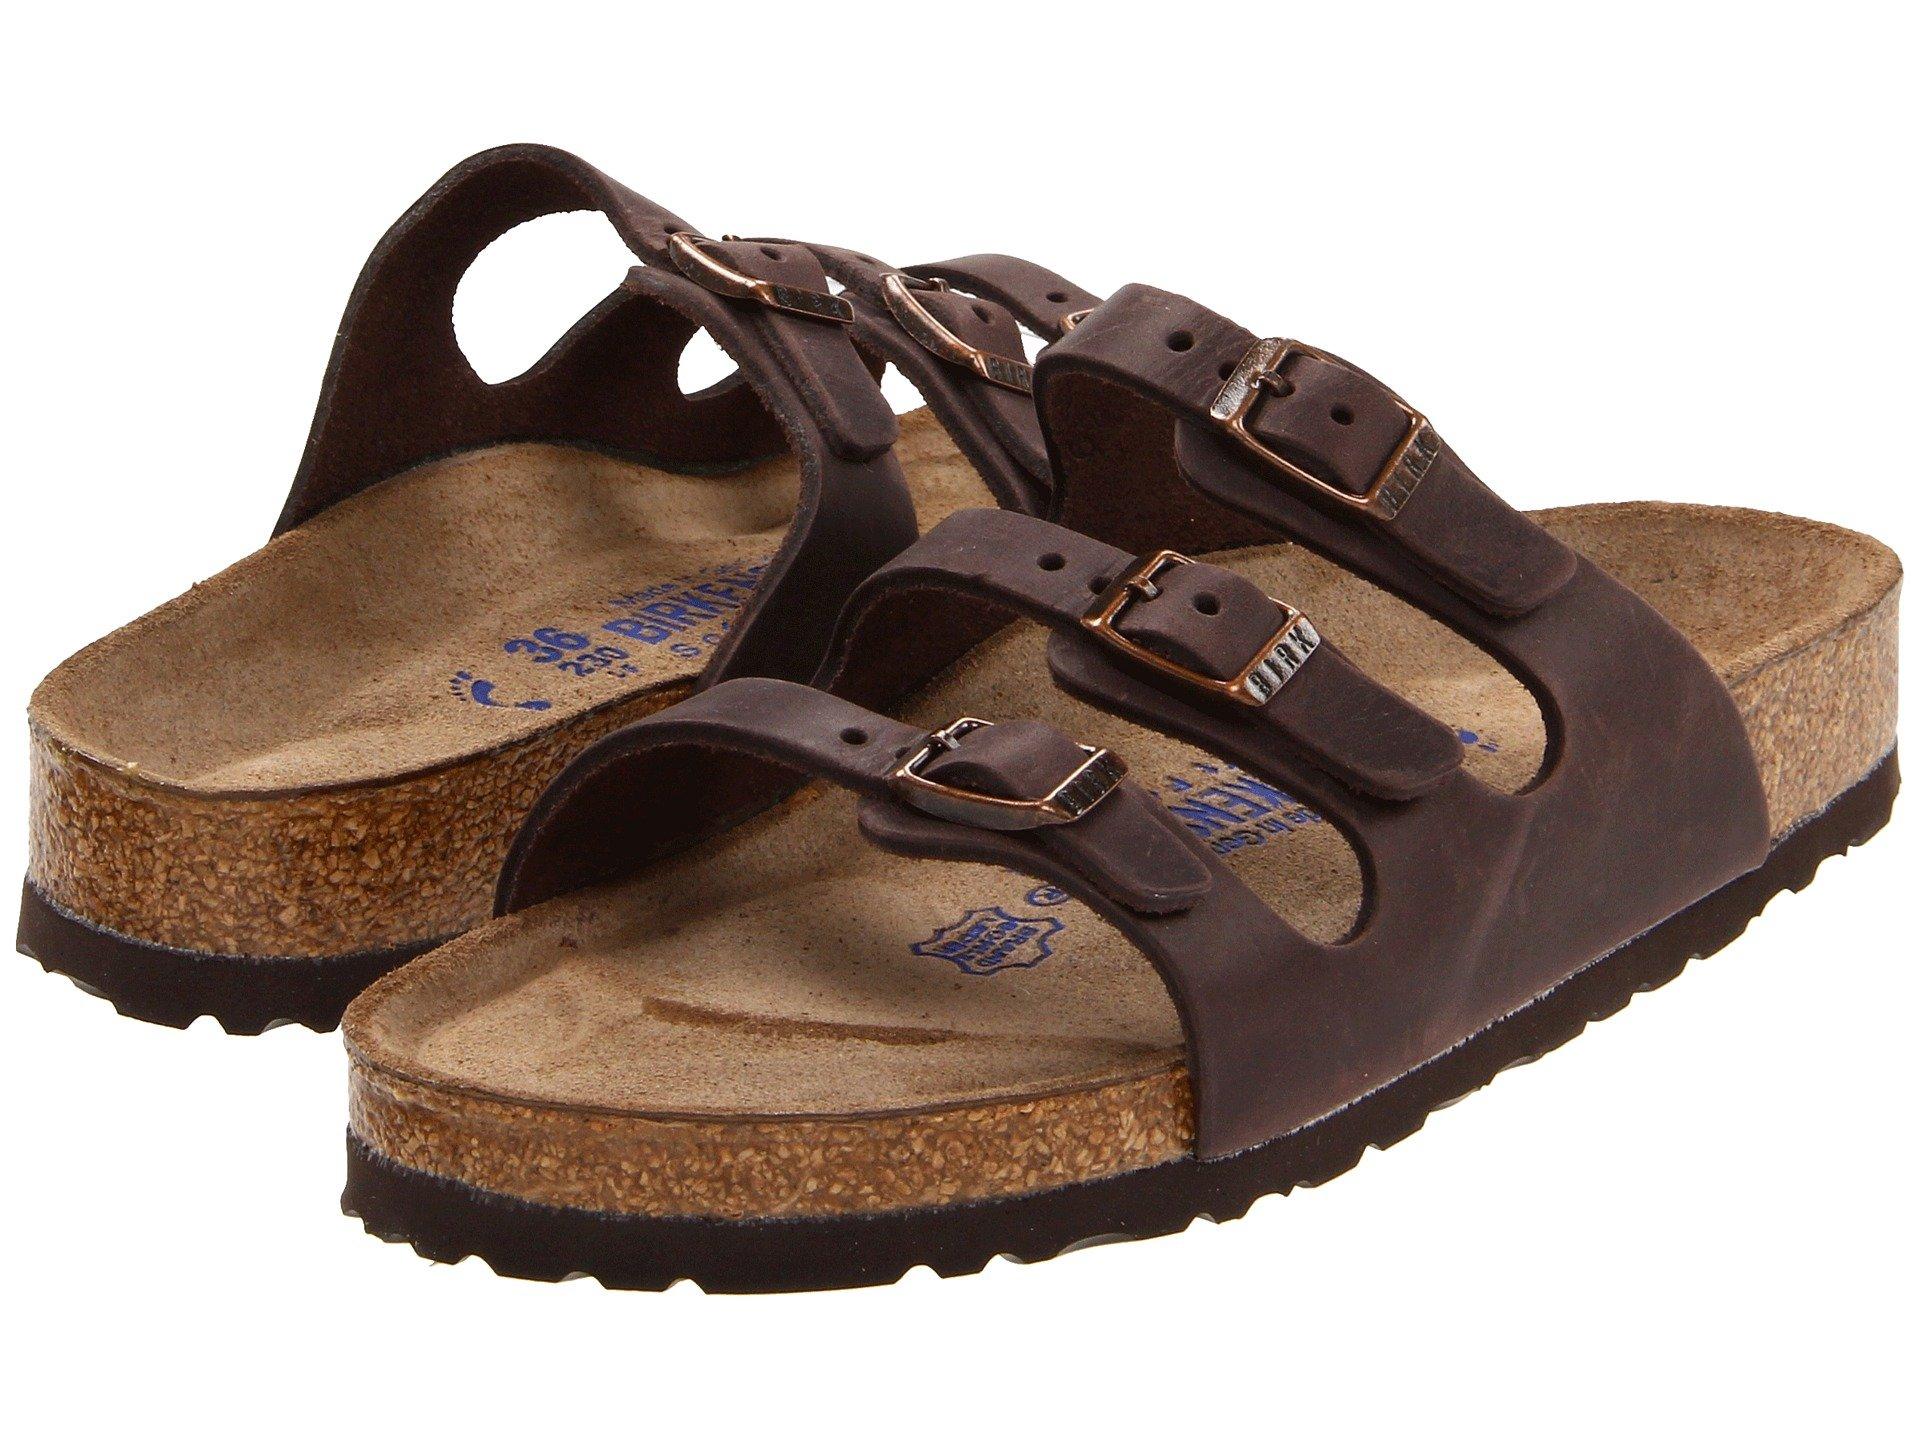 3b7410e5ad9 Women s Birkenstock Sandals + FREE SHIPPING